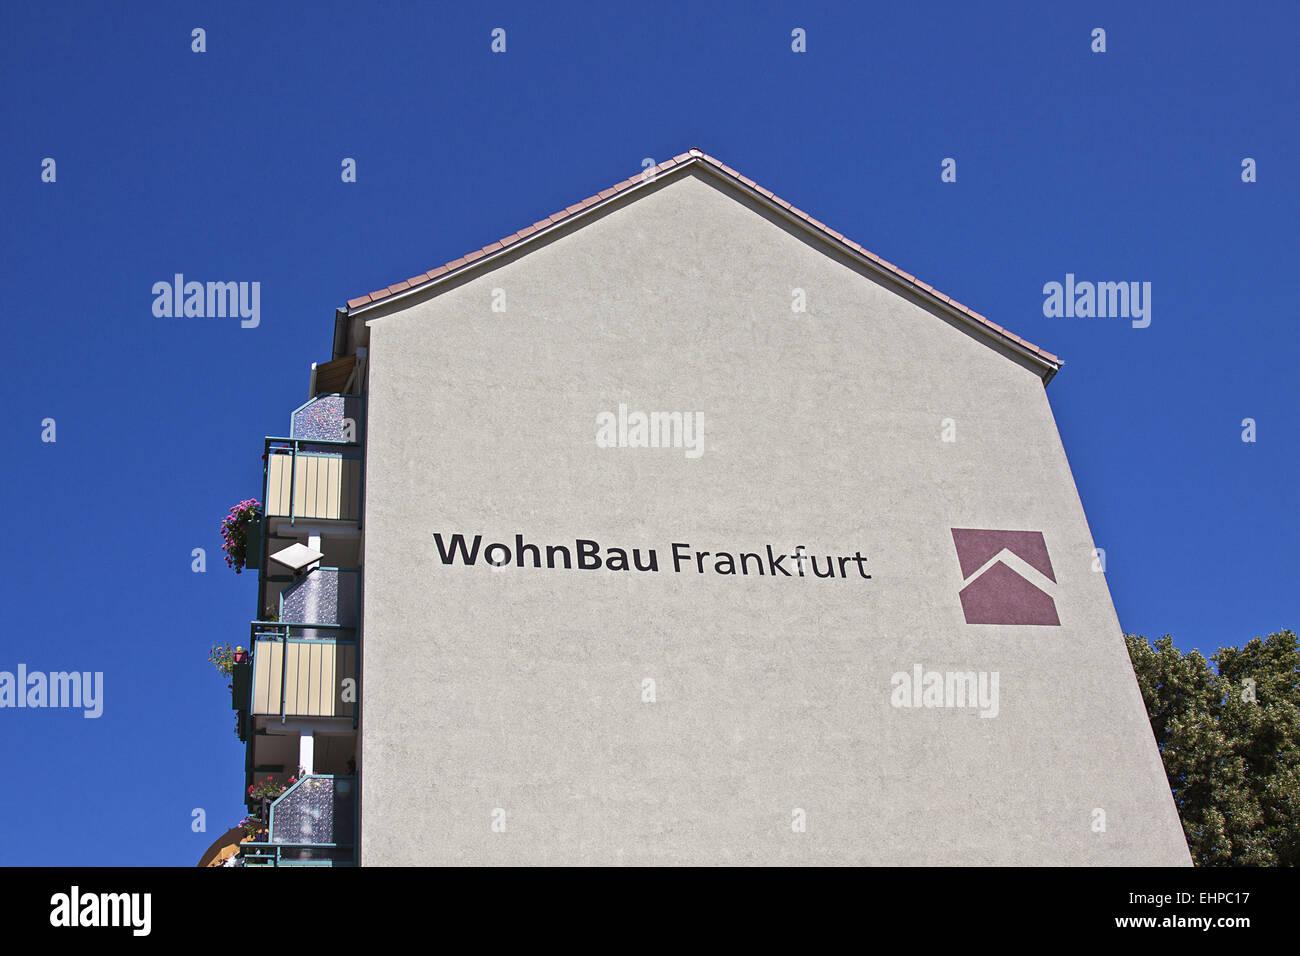 wohnbau frankfurt stockfoto bild 79783011 alamy. Black Bedroom Furniture Sets. Home Design Ideas